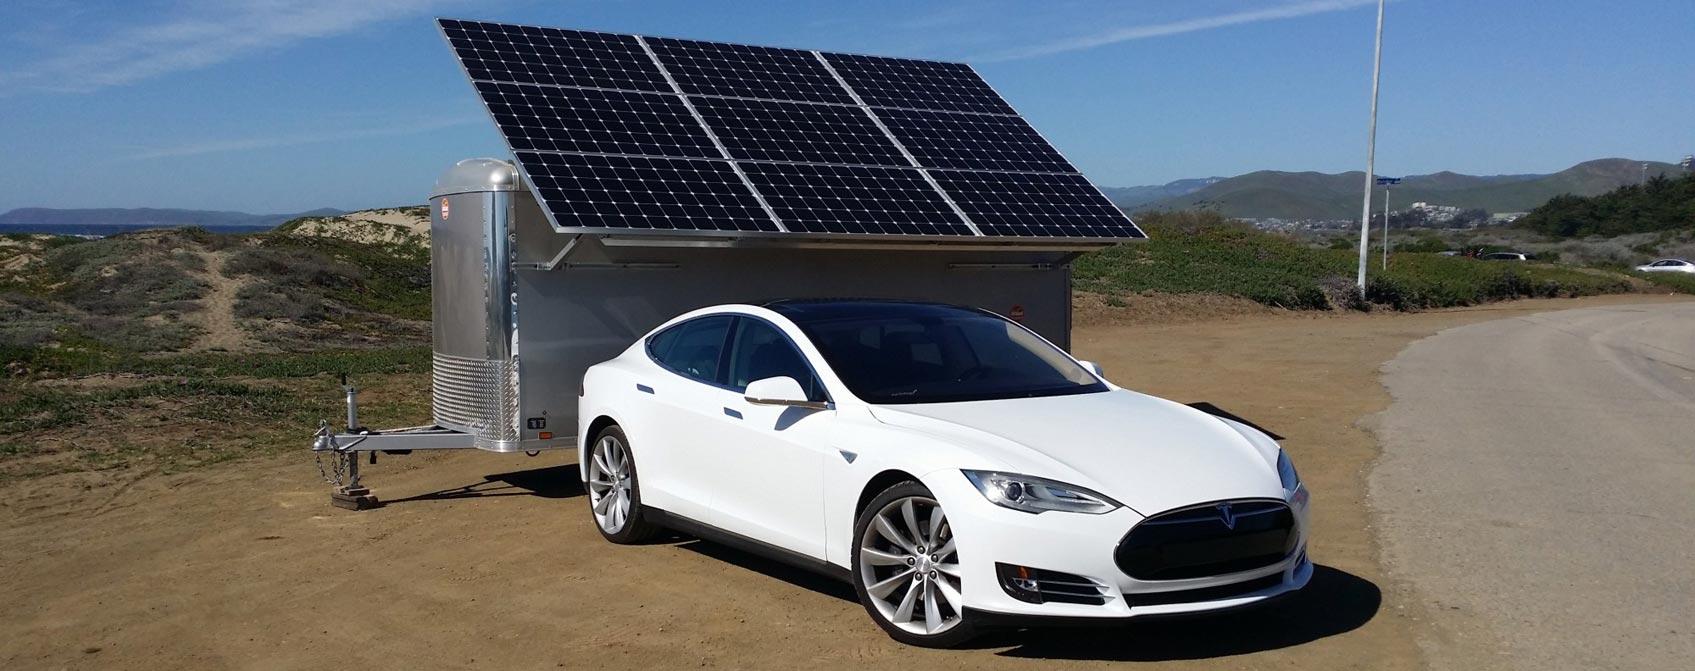 solar-generator-tesla